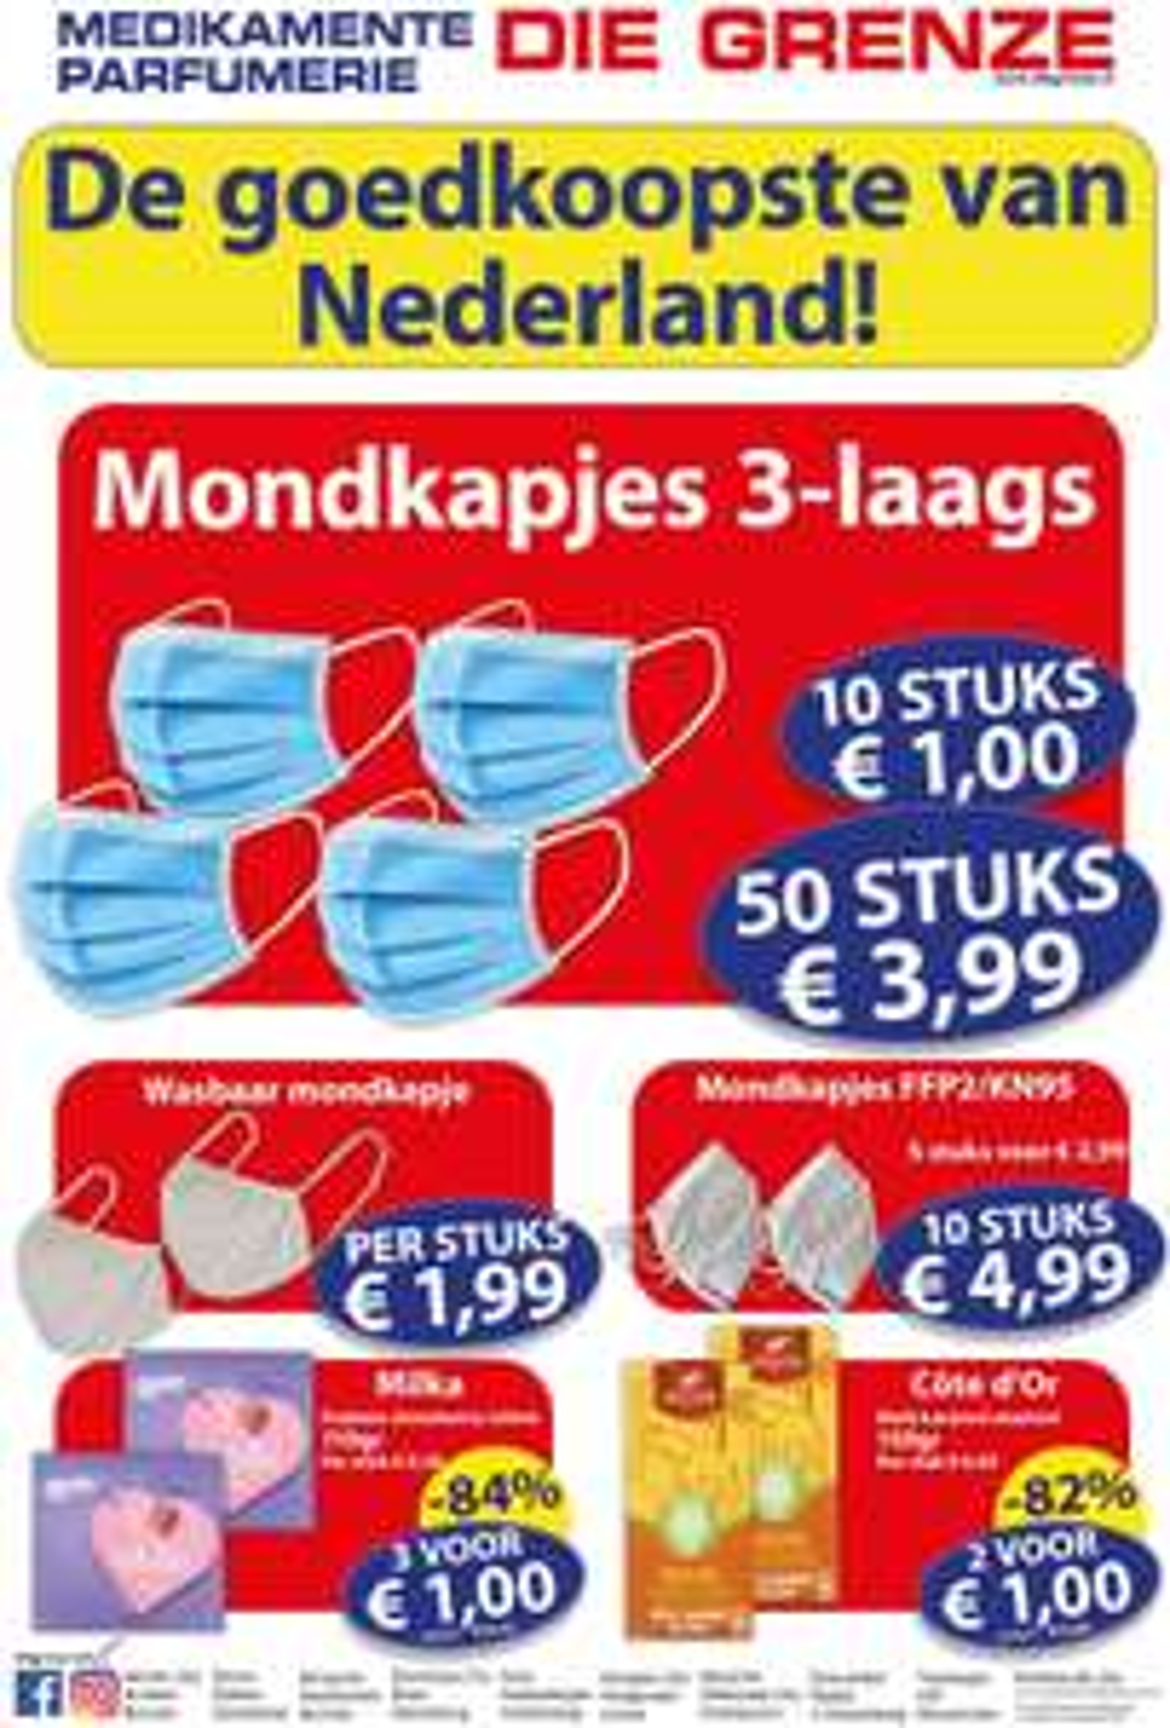 Mondkapjes 50 stuks €3,99